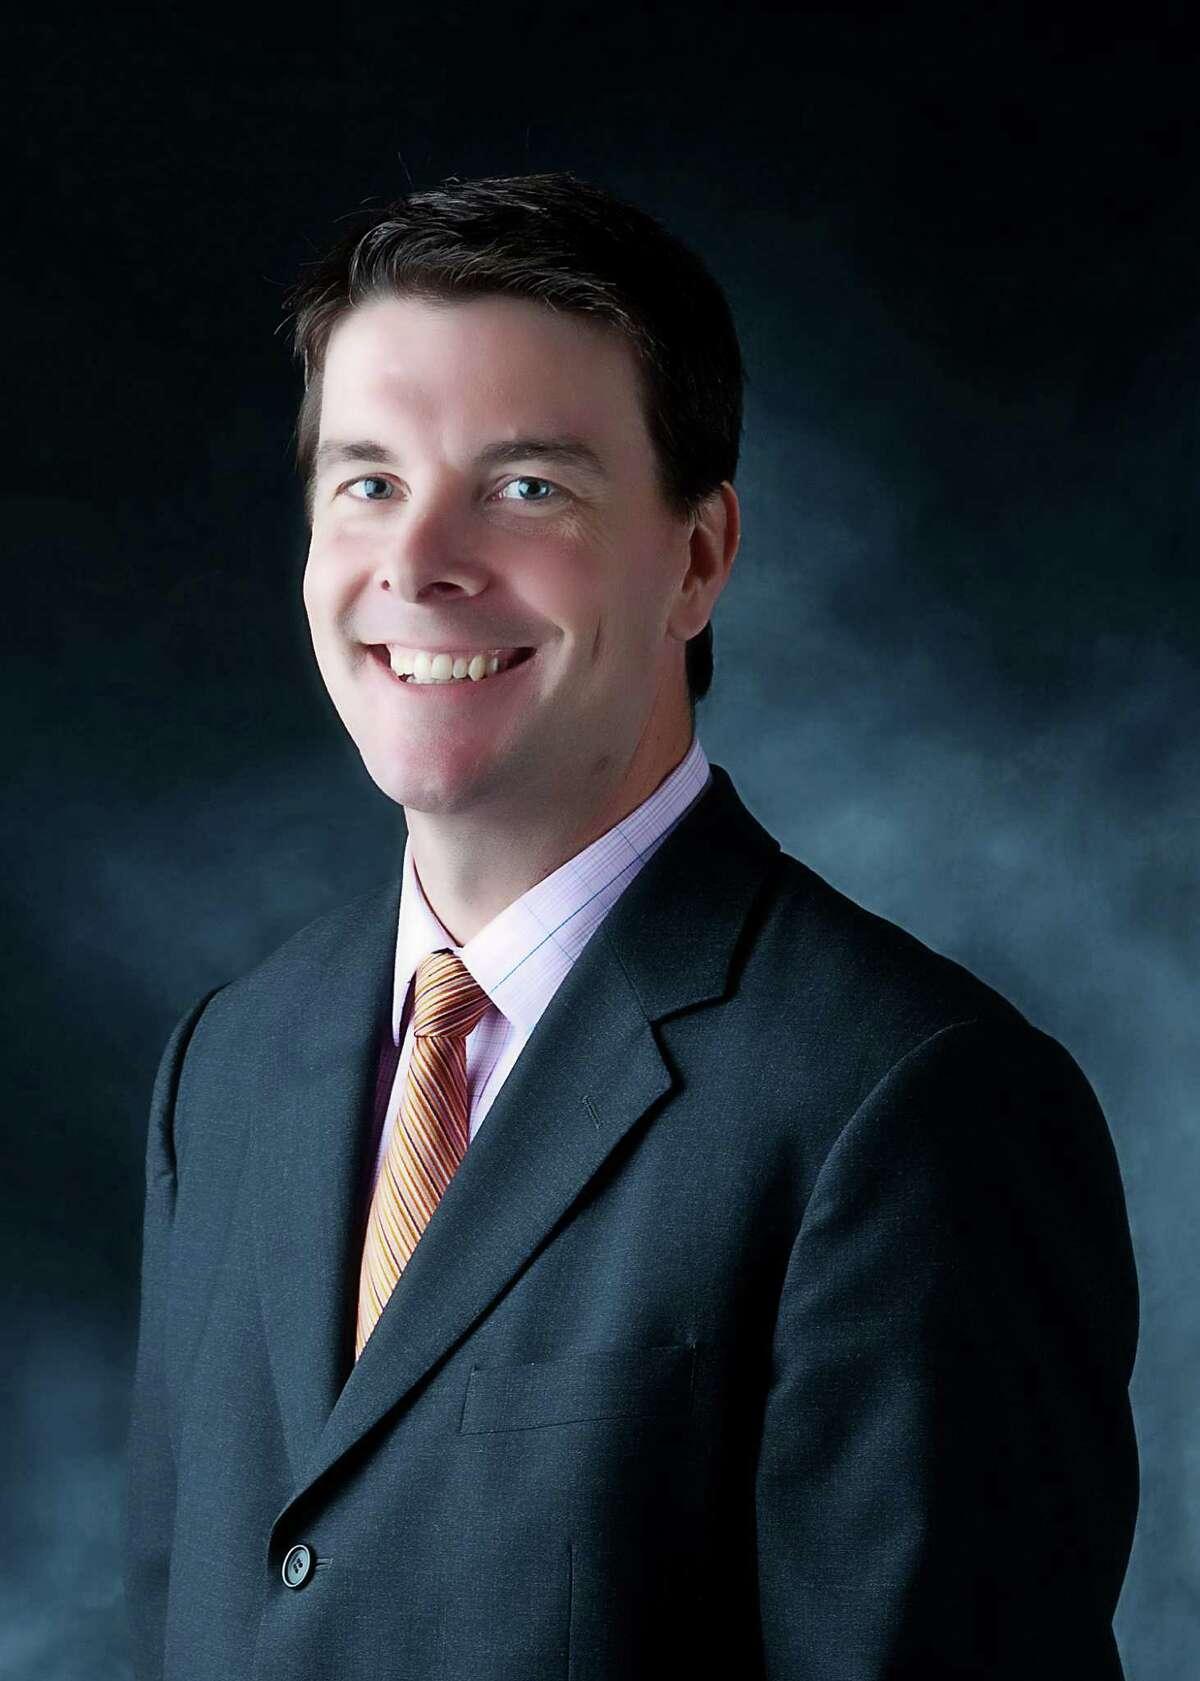 Kiernan O'Connor of Ellis & Ellis is a board member on the Planned Giving Council of Houston.